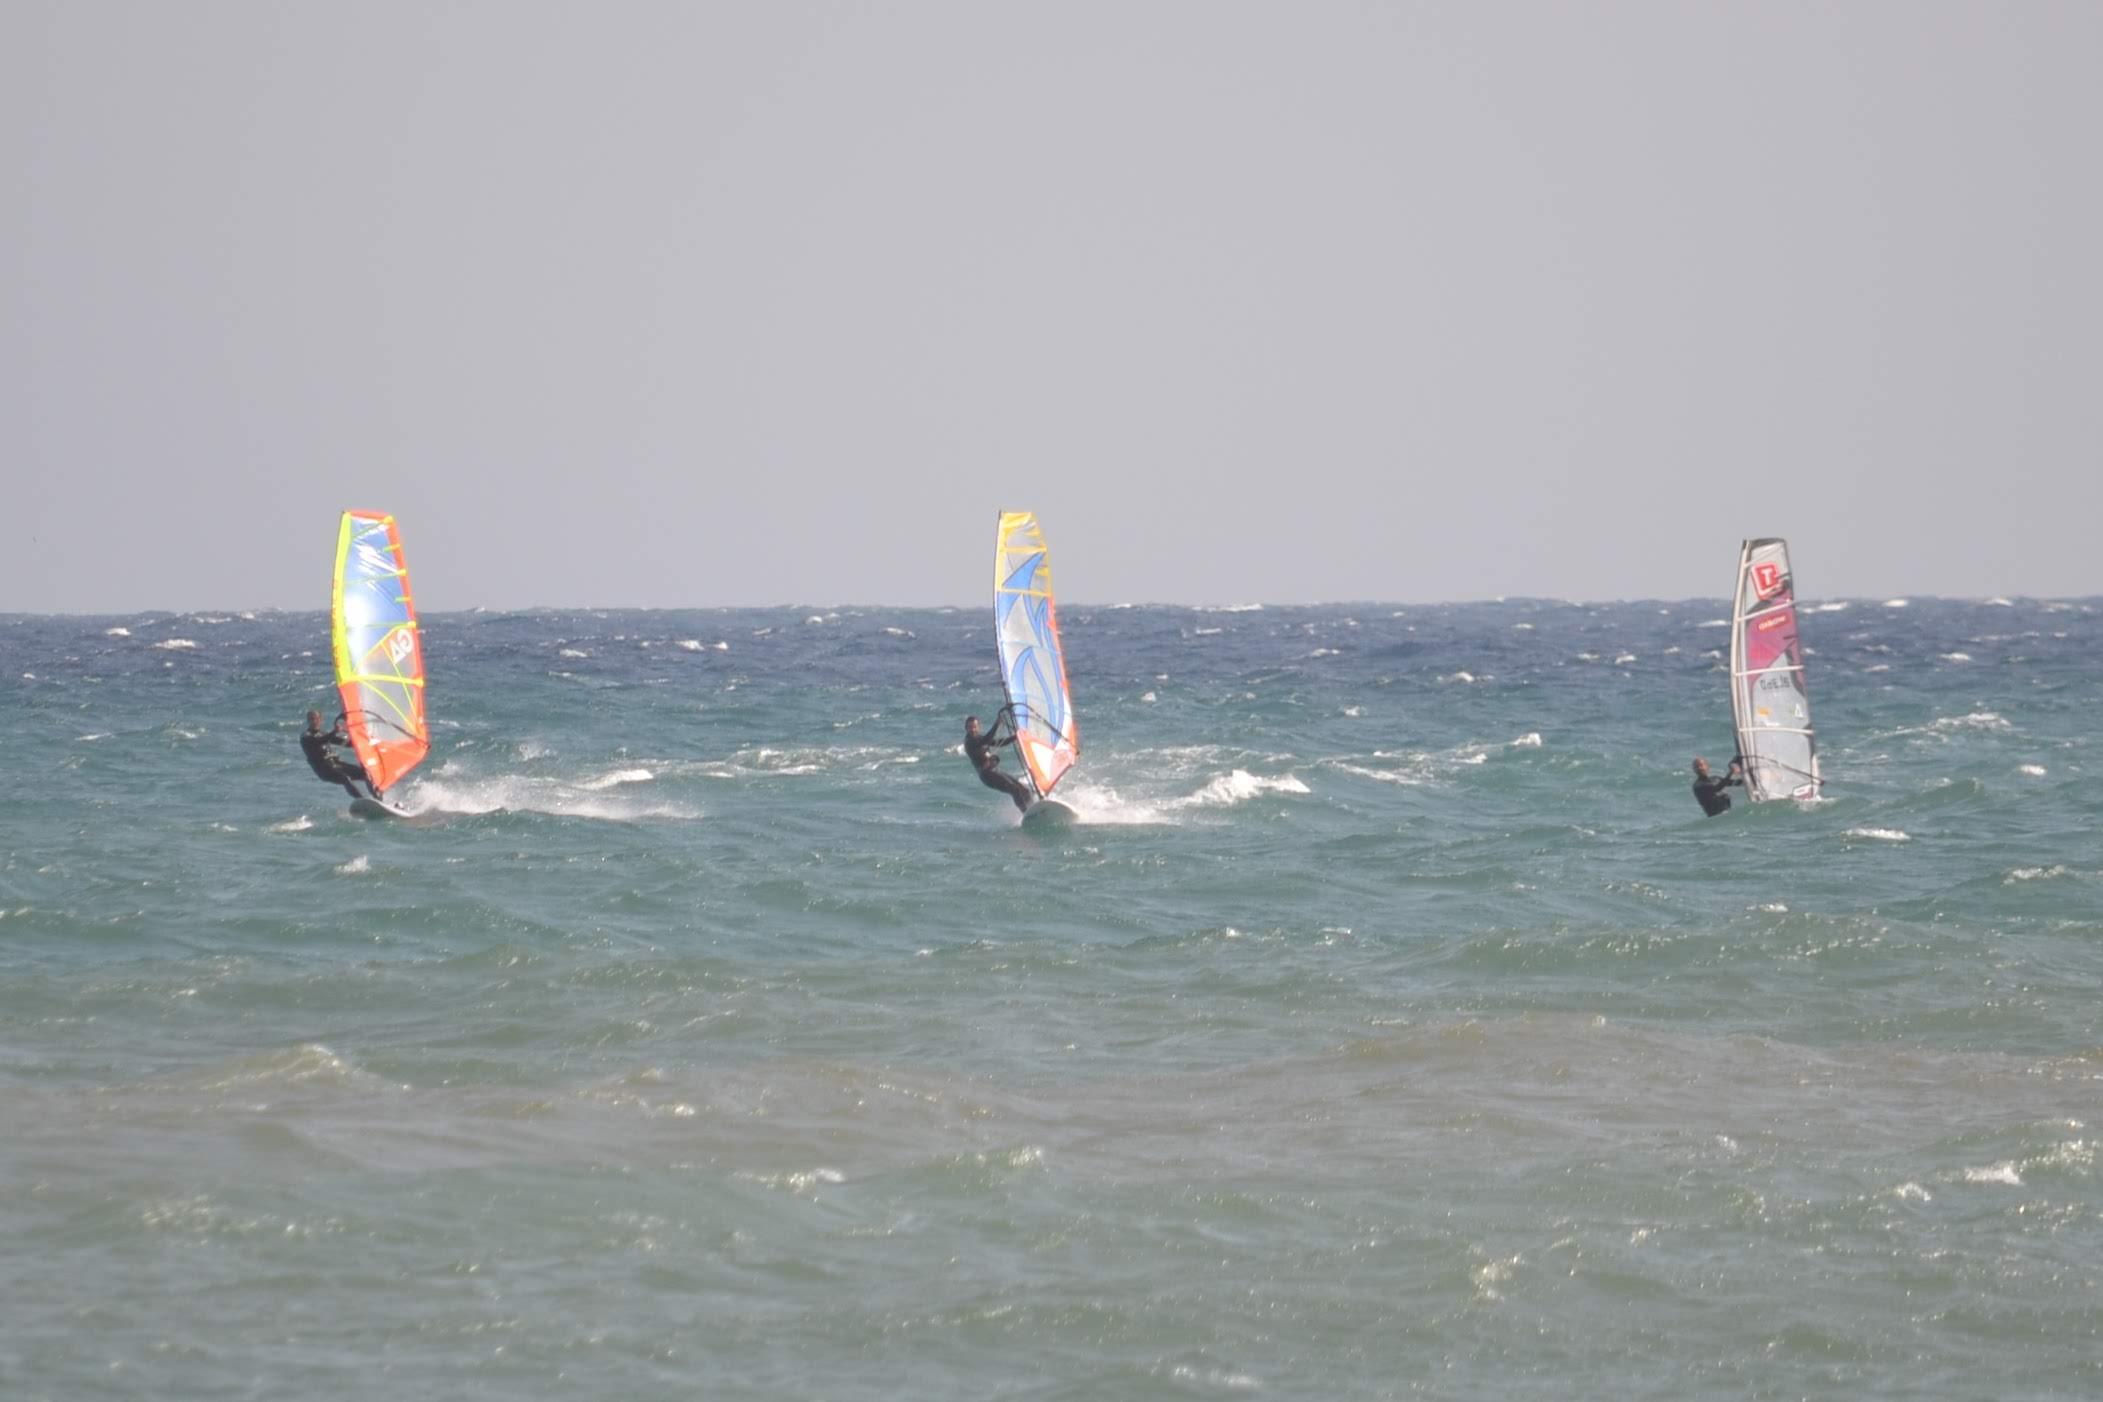 Windcambrils